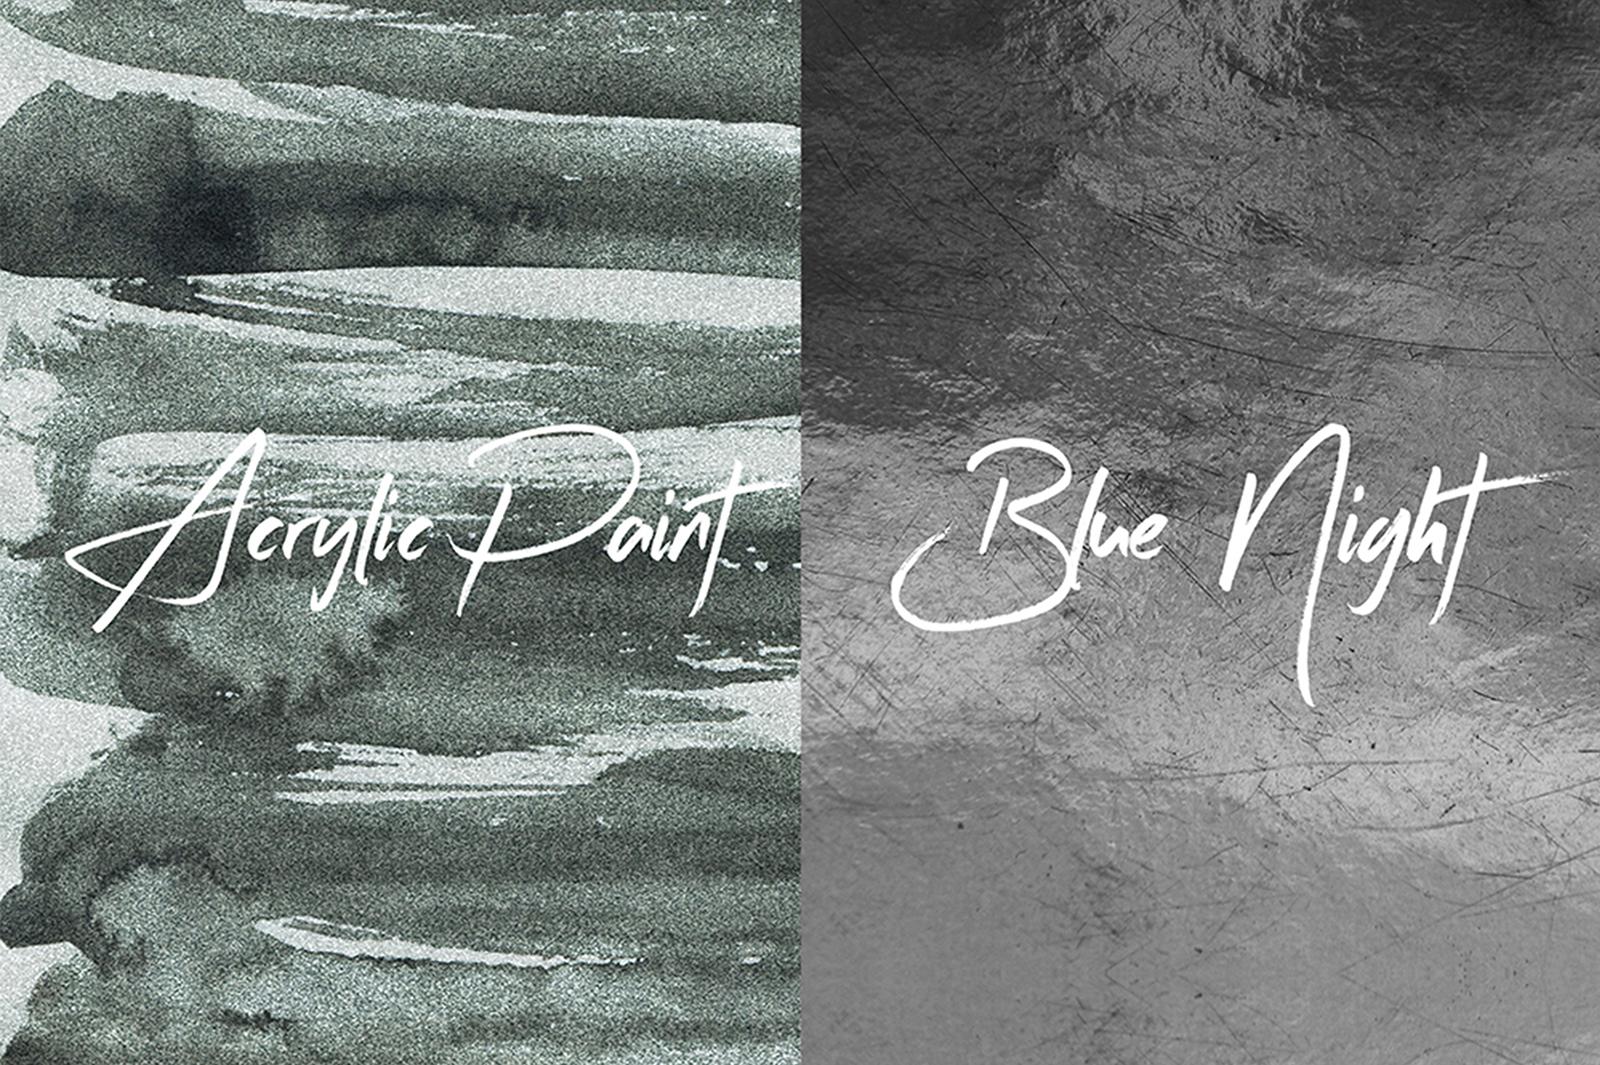 5 Mono Grunge Textures example image 2